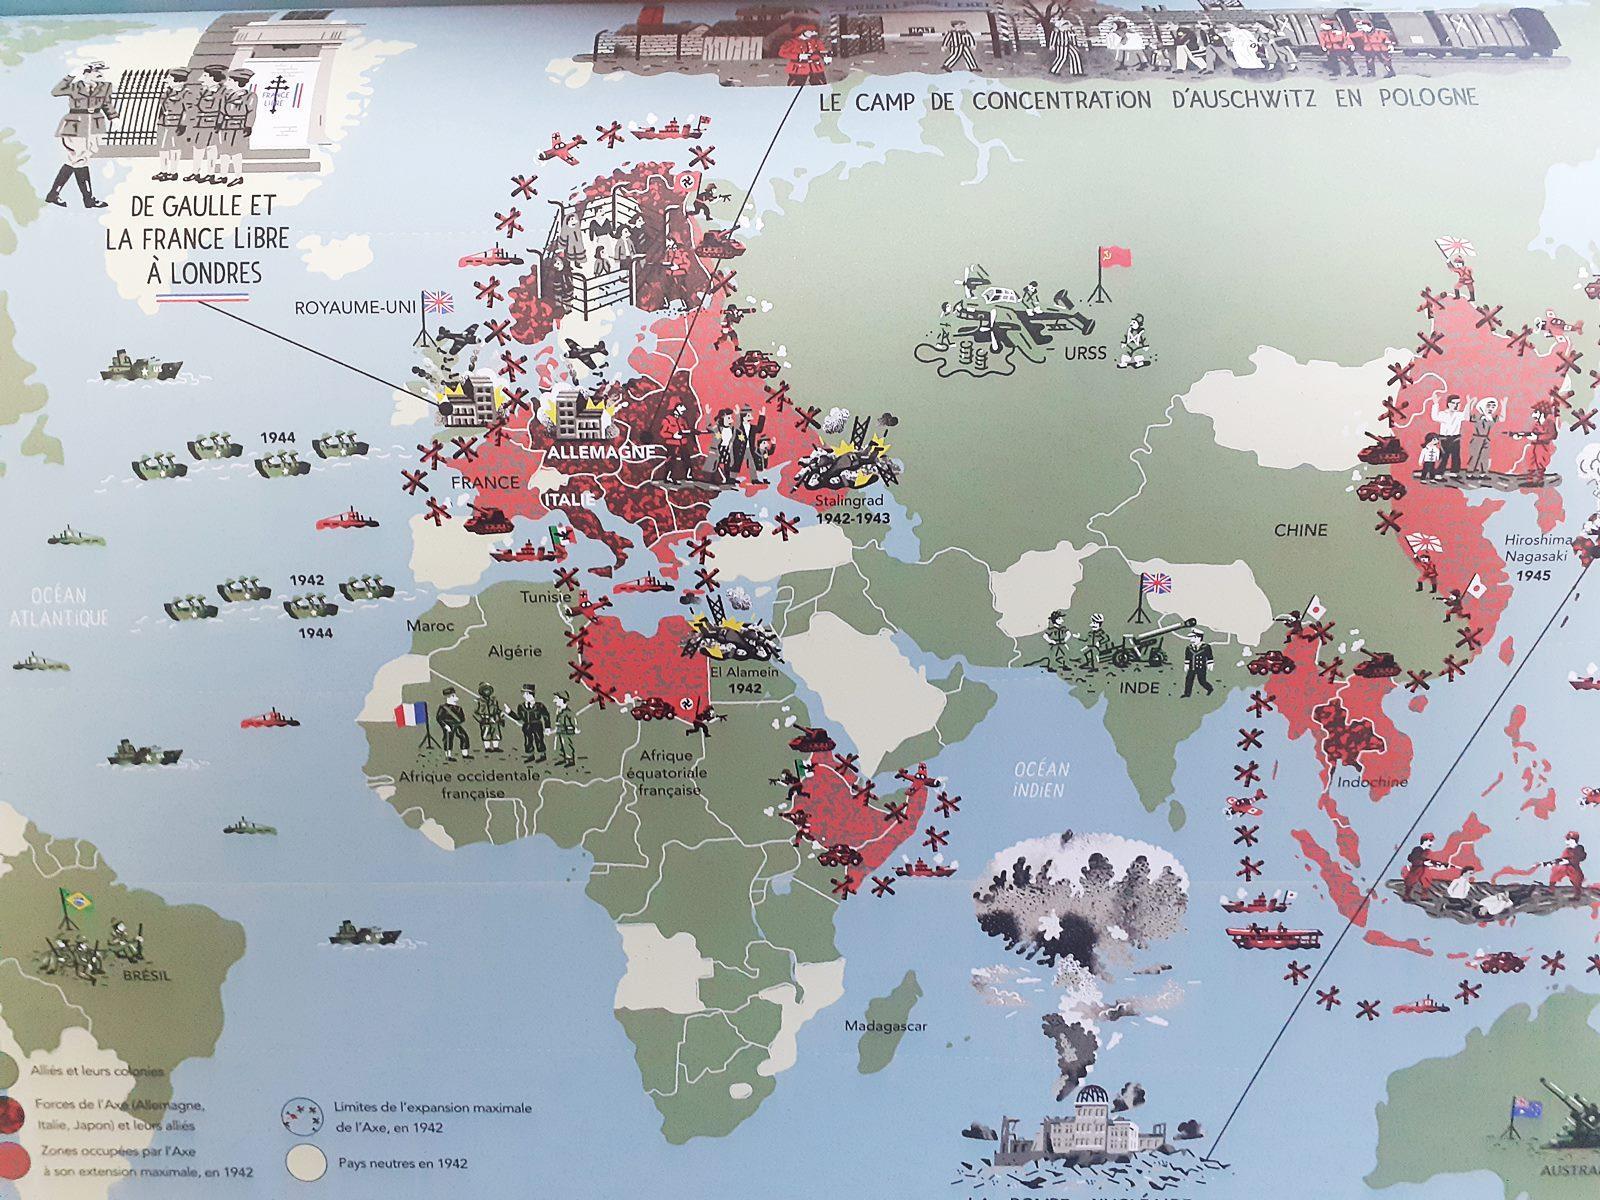 Atlas histoire france20210825 142902